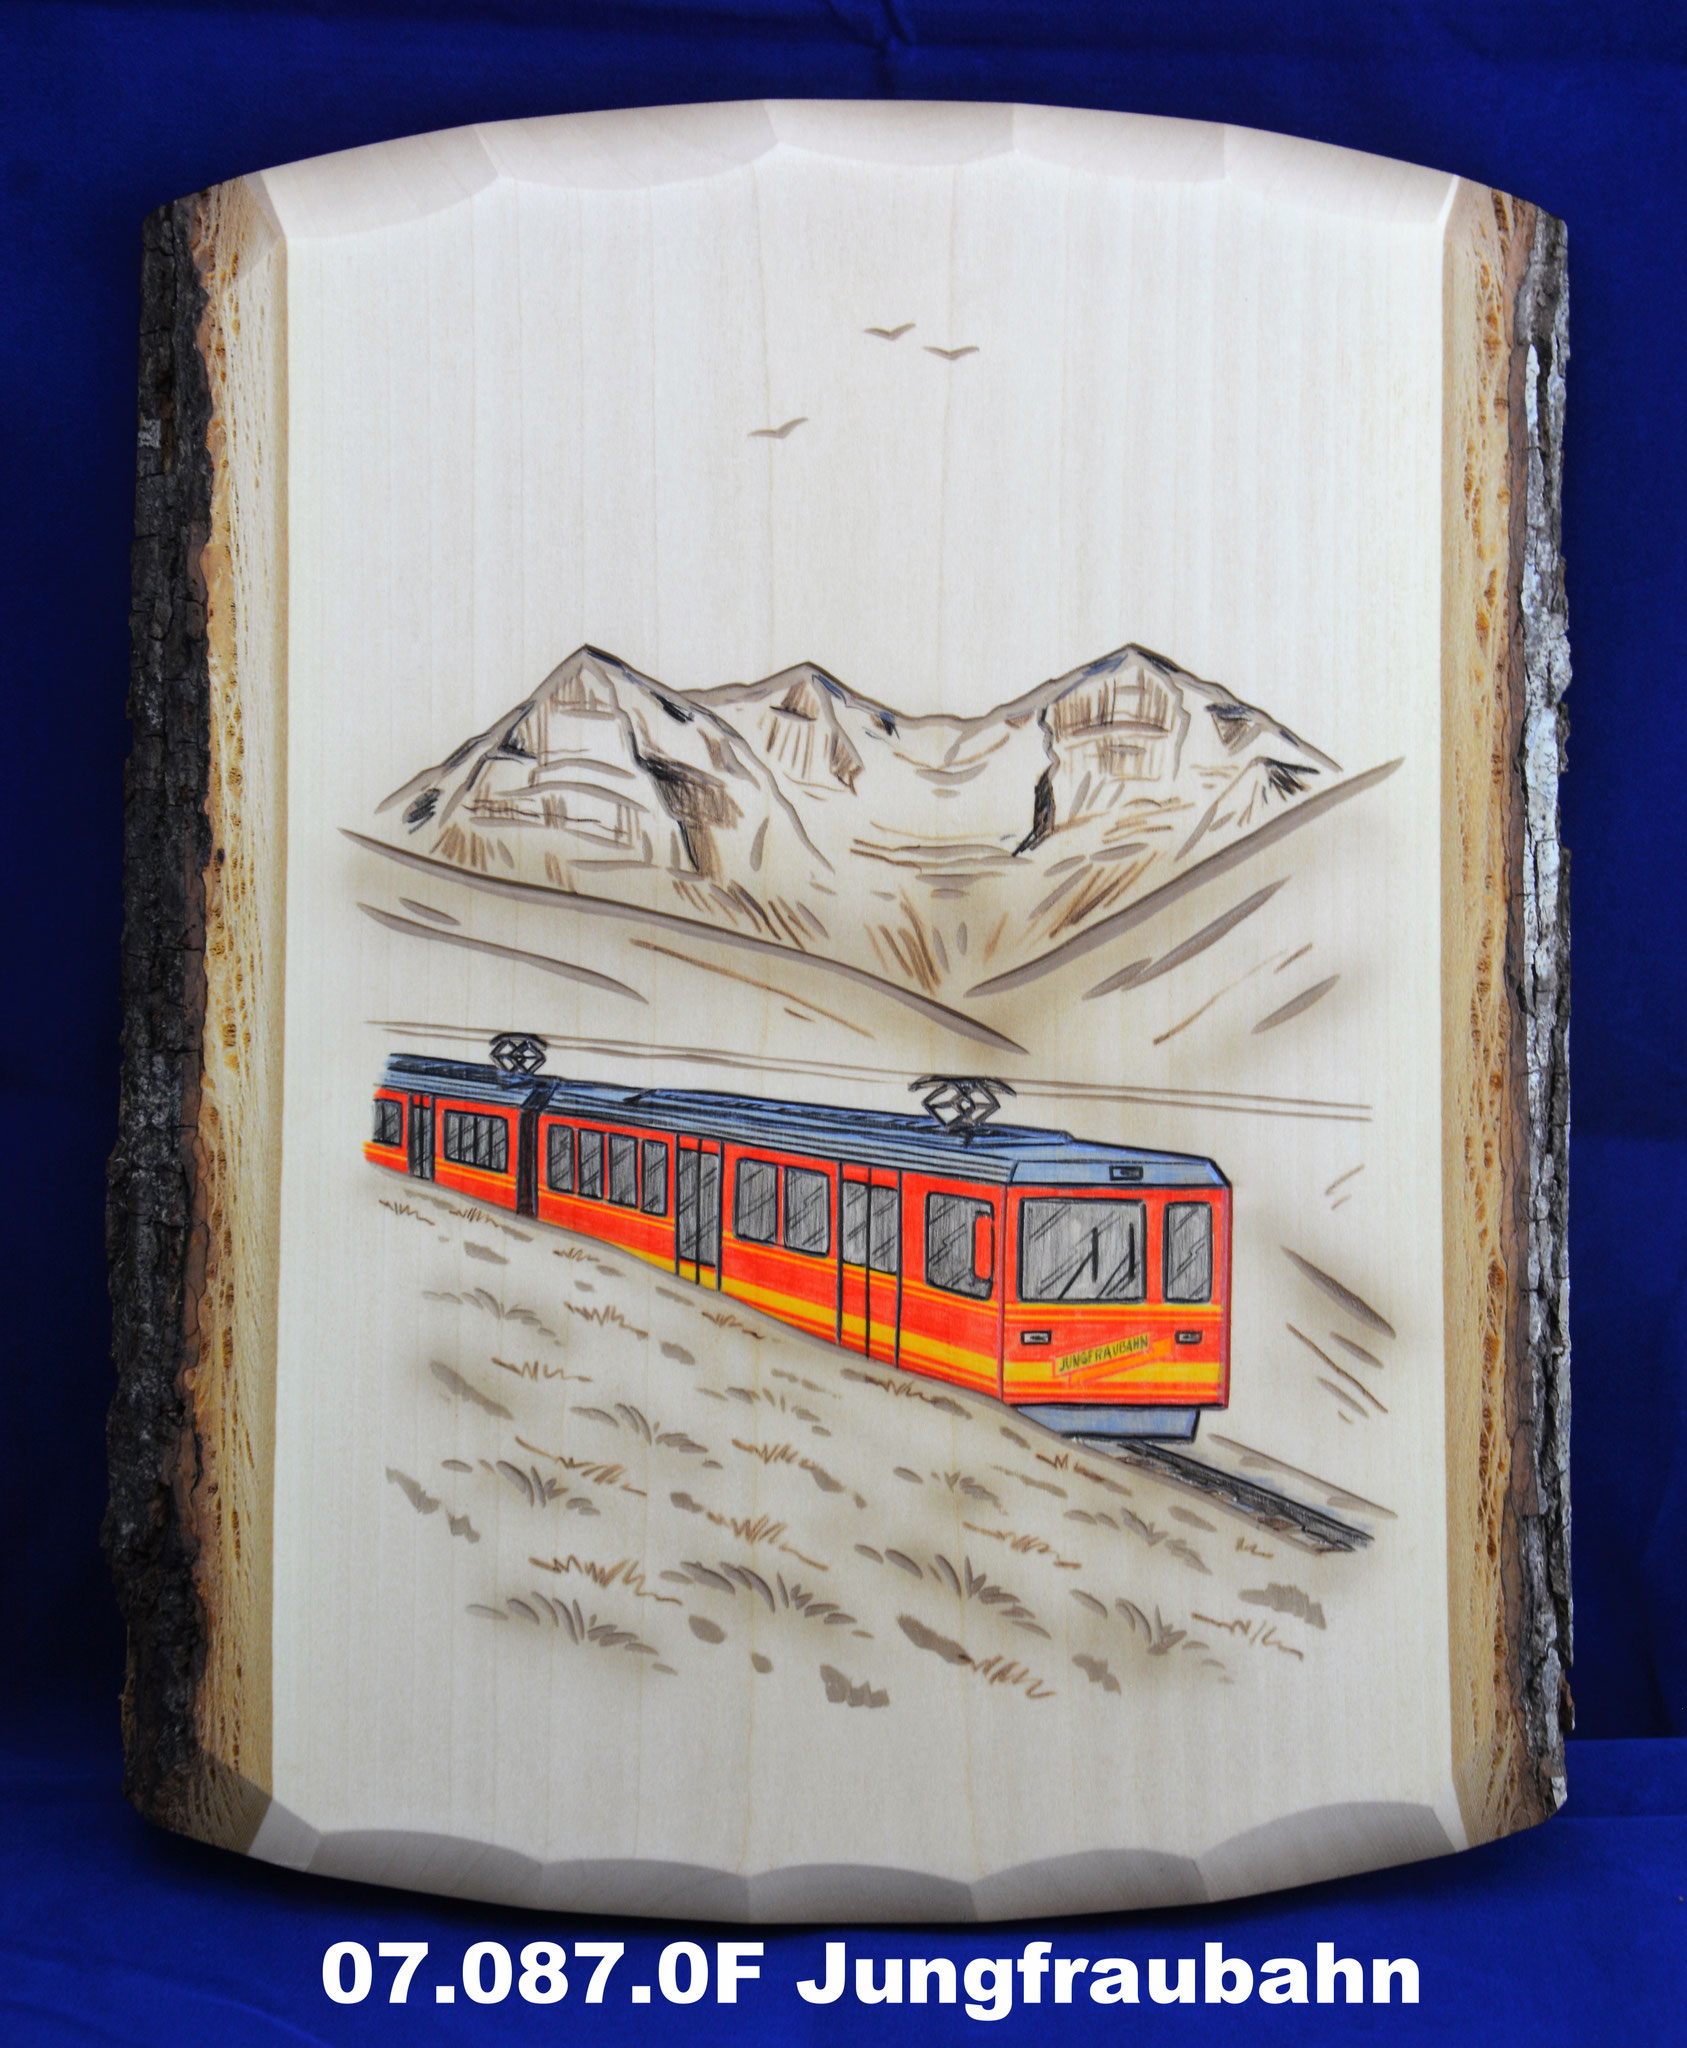 07.086.0F Jungfraubahn